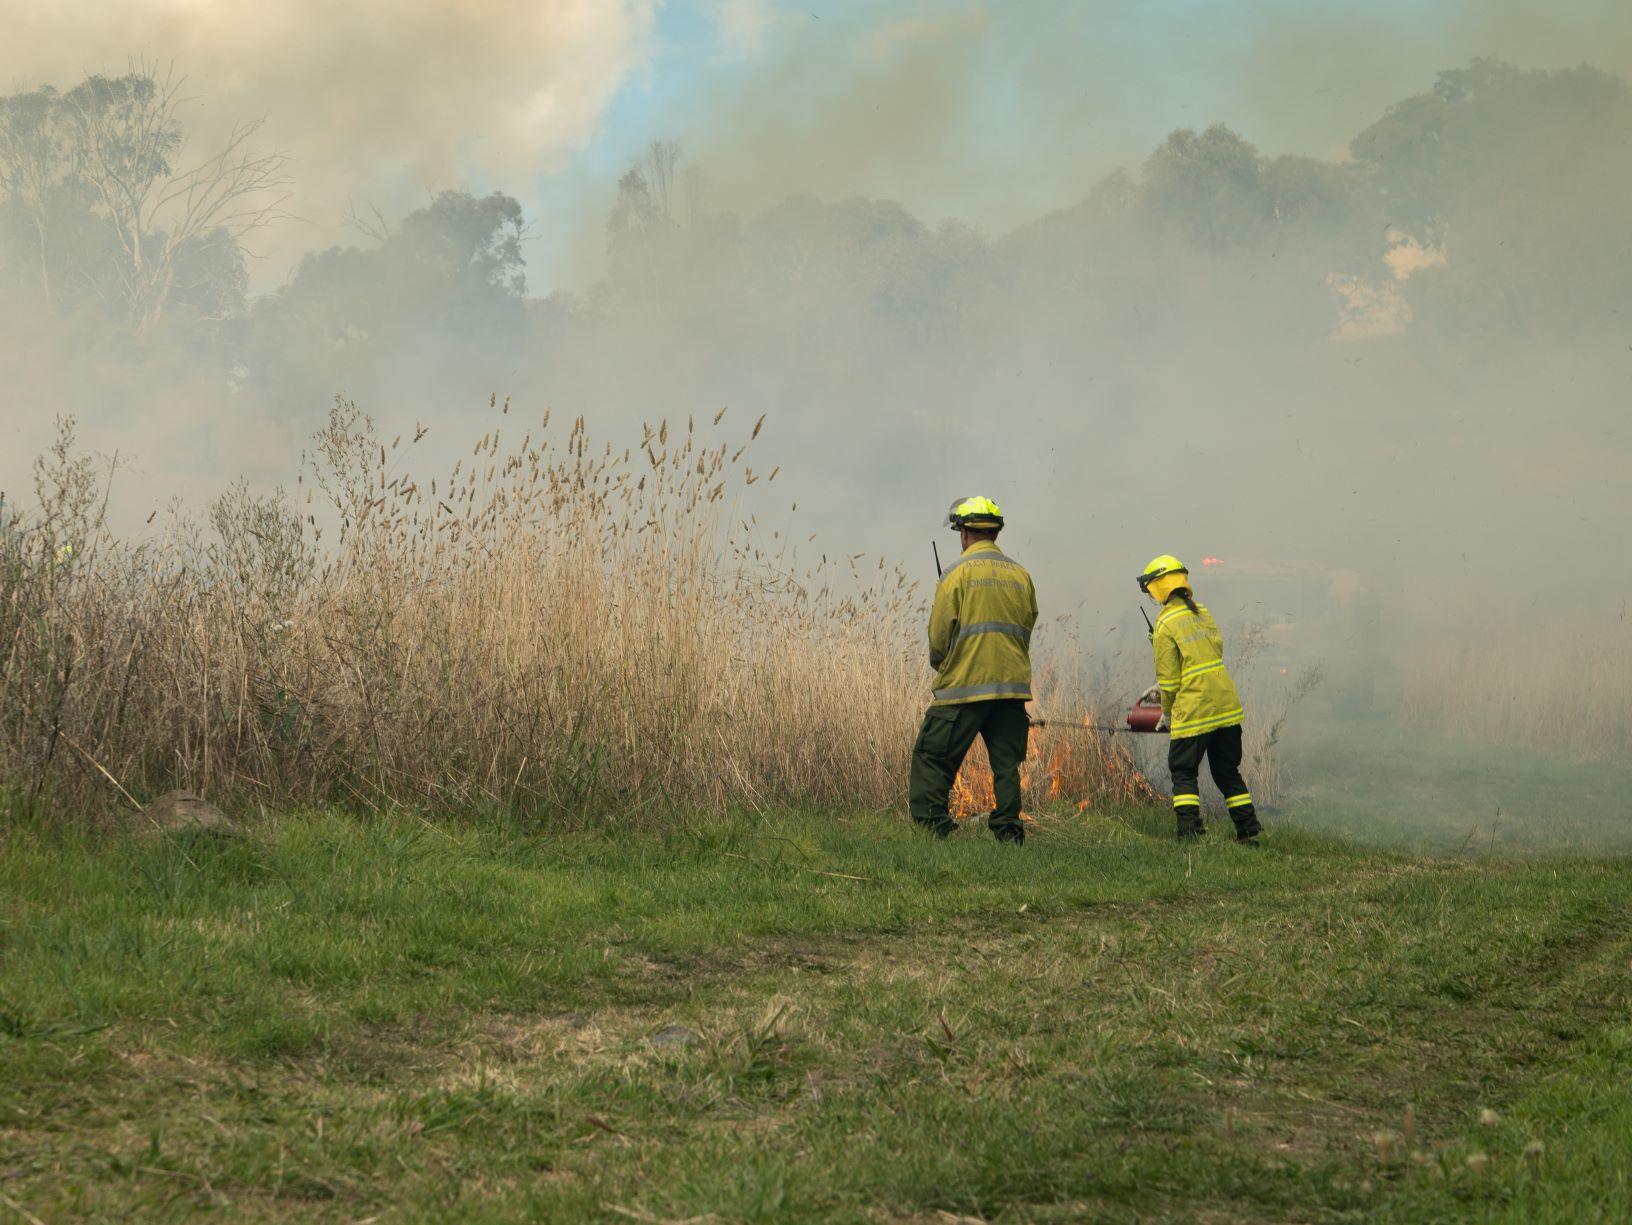 Two rangers lighting a fire in long grass